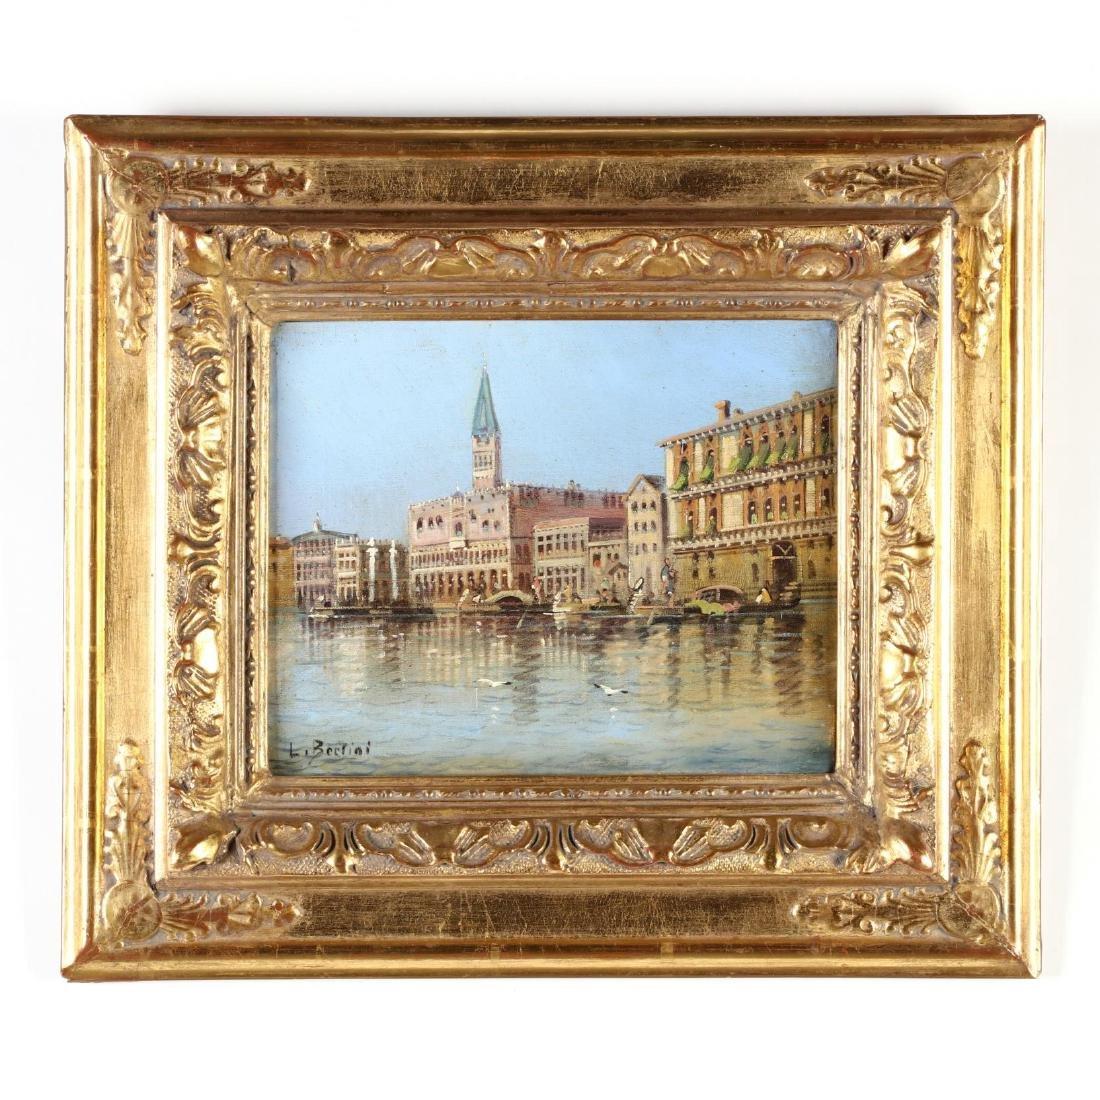 Karl Kaufmann (Austrian, 1843-1901), Venice Canal View